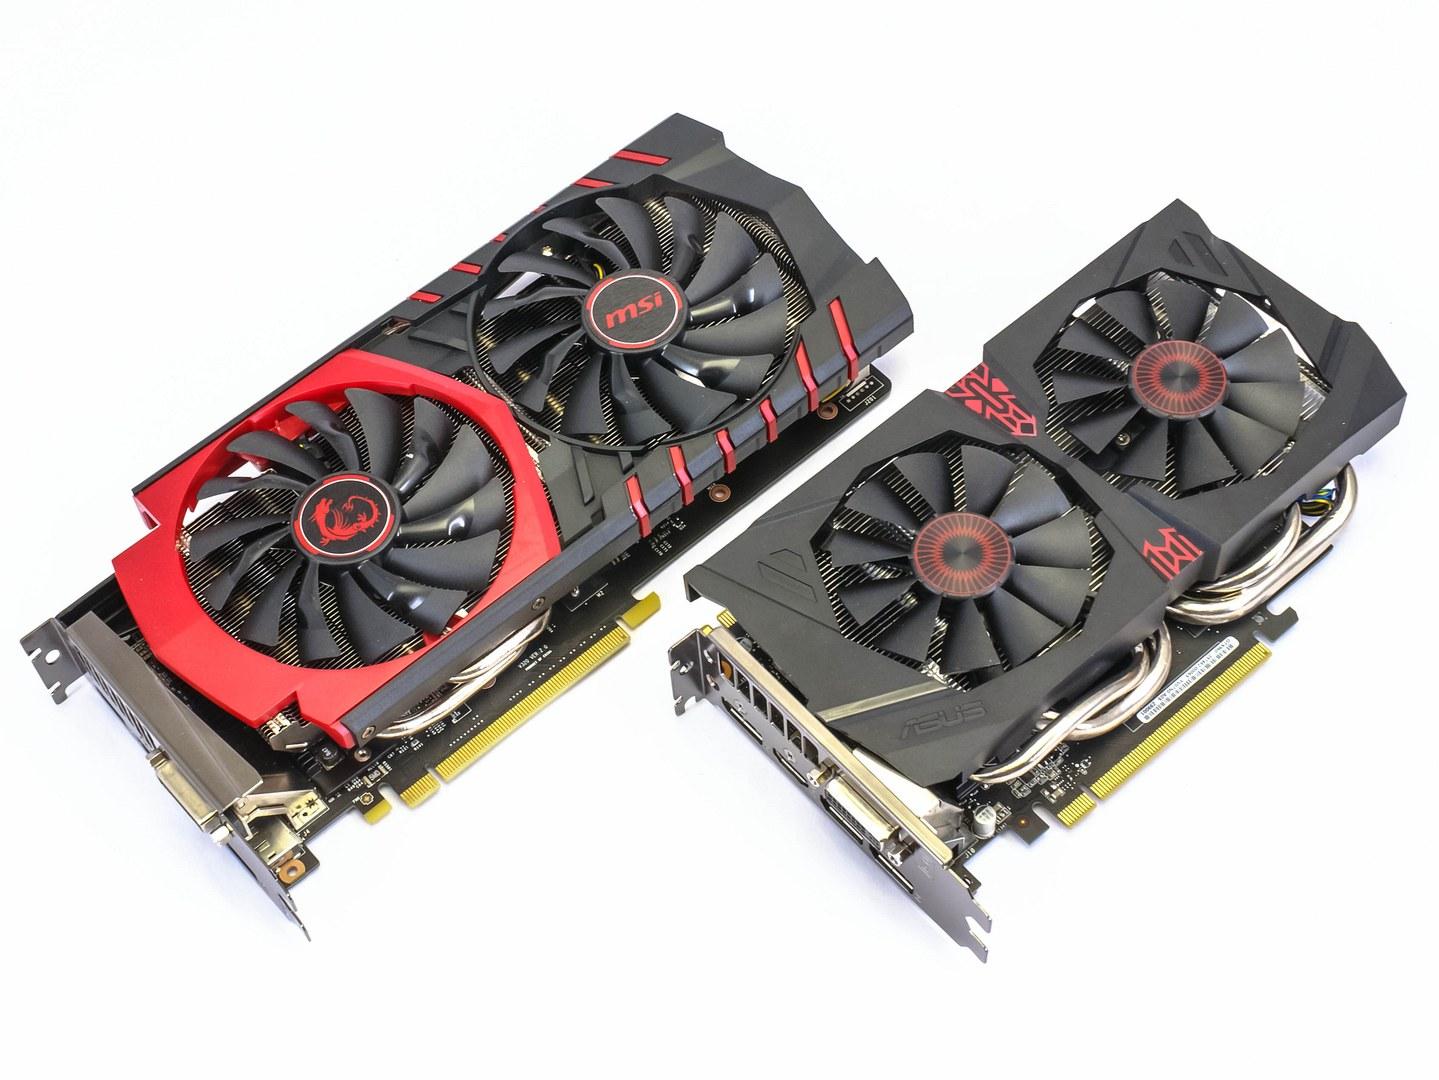 Nový Maxwell v testu: Asus GTX 960 OC a MSI GTX 960 Gaming